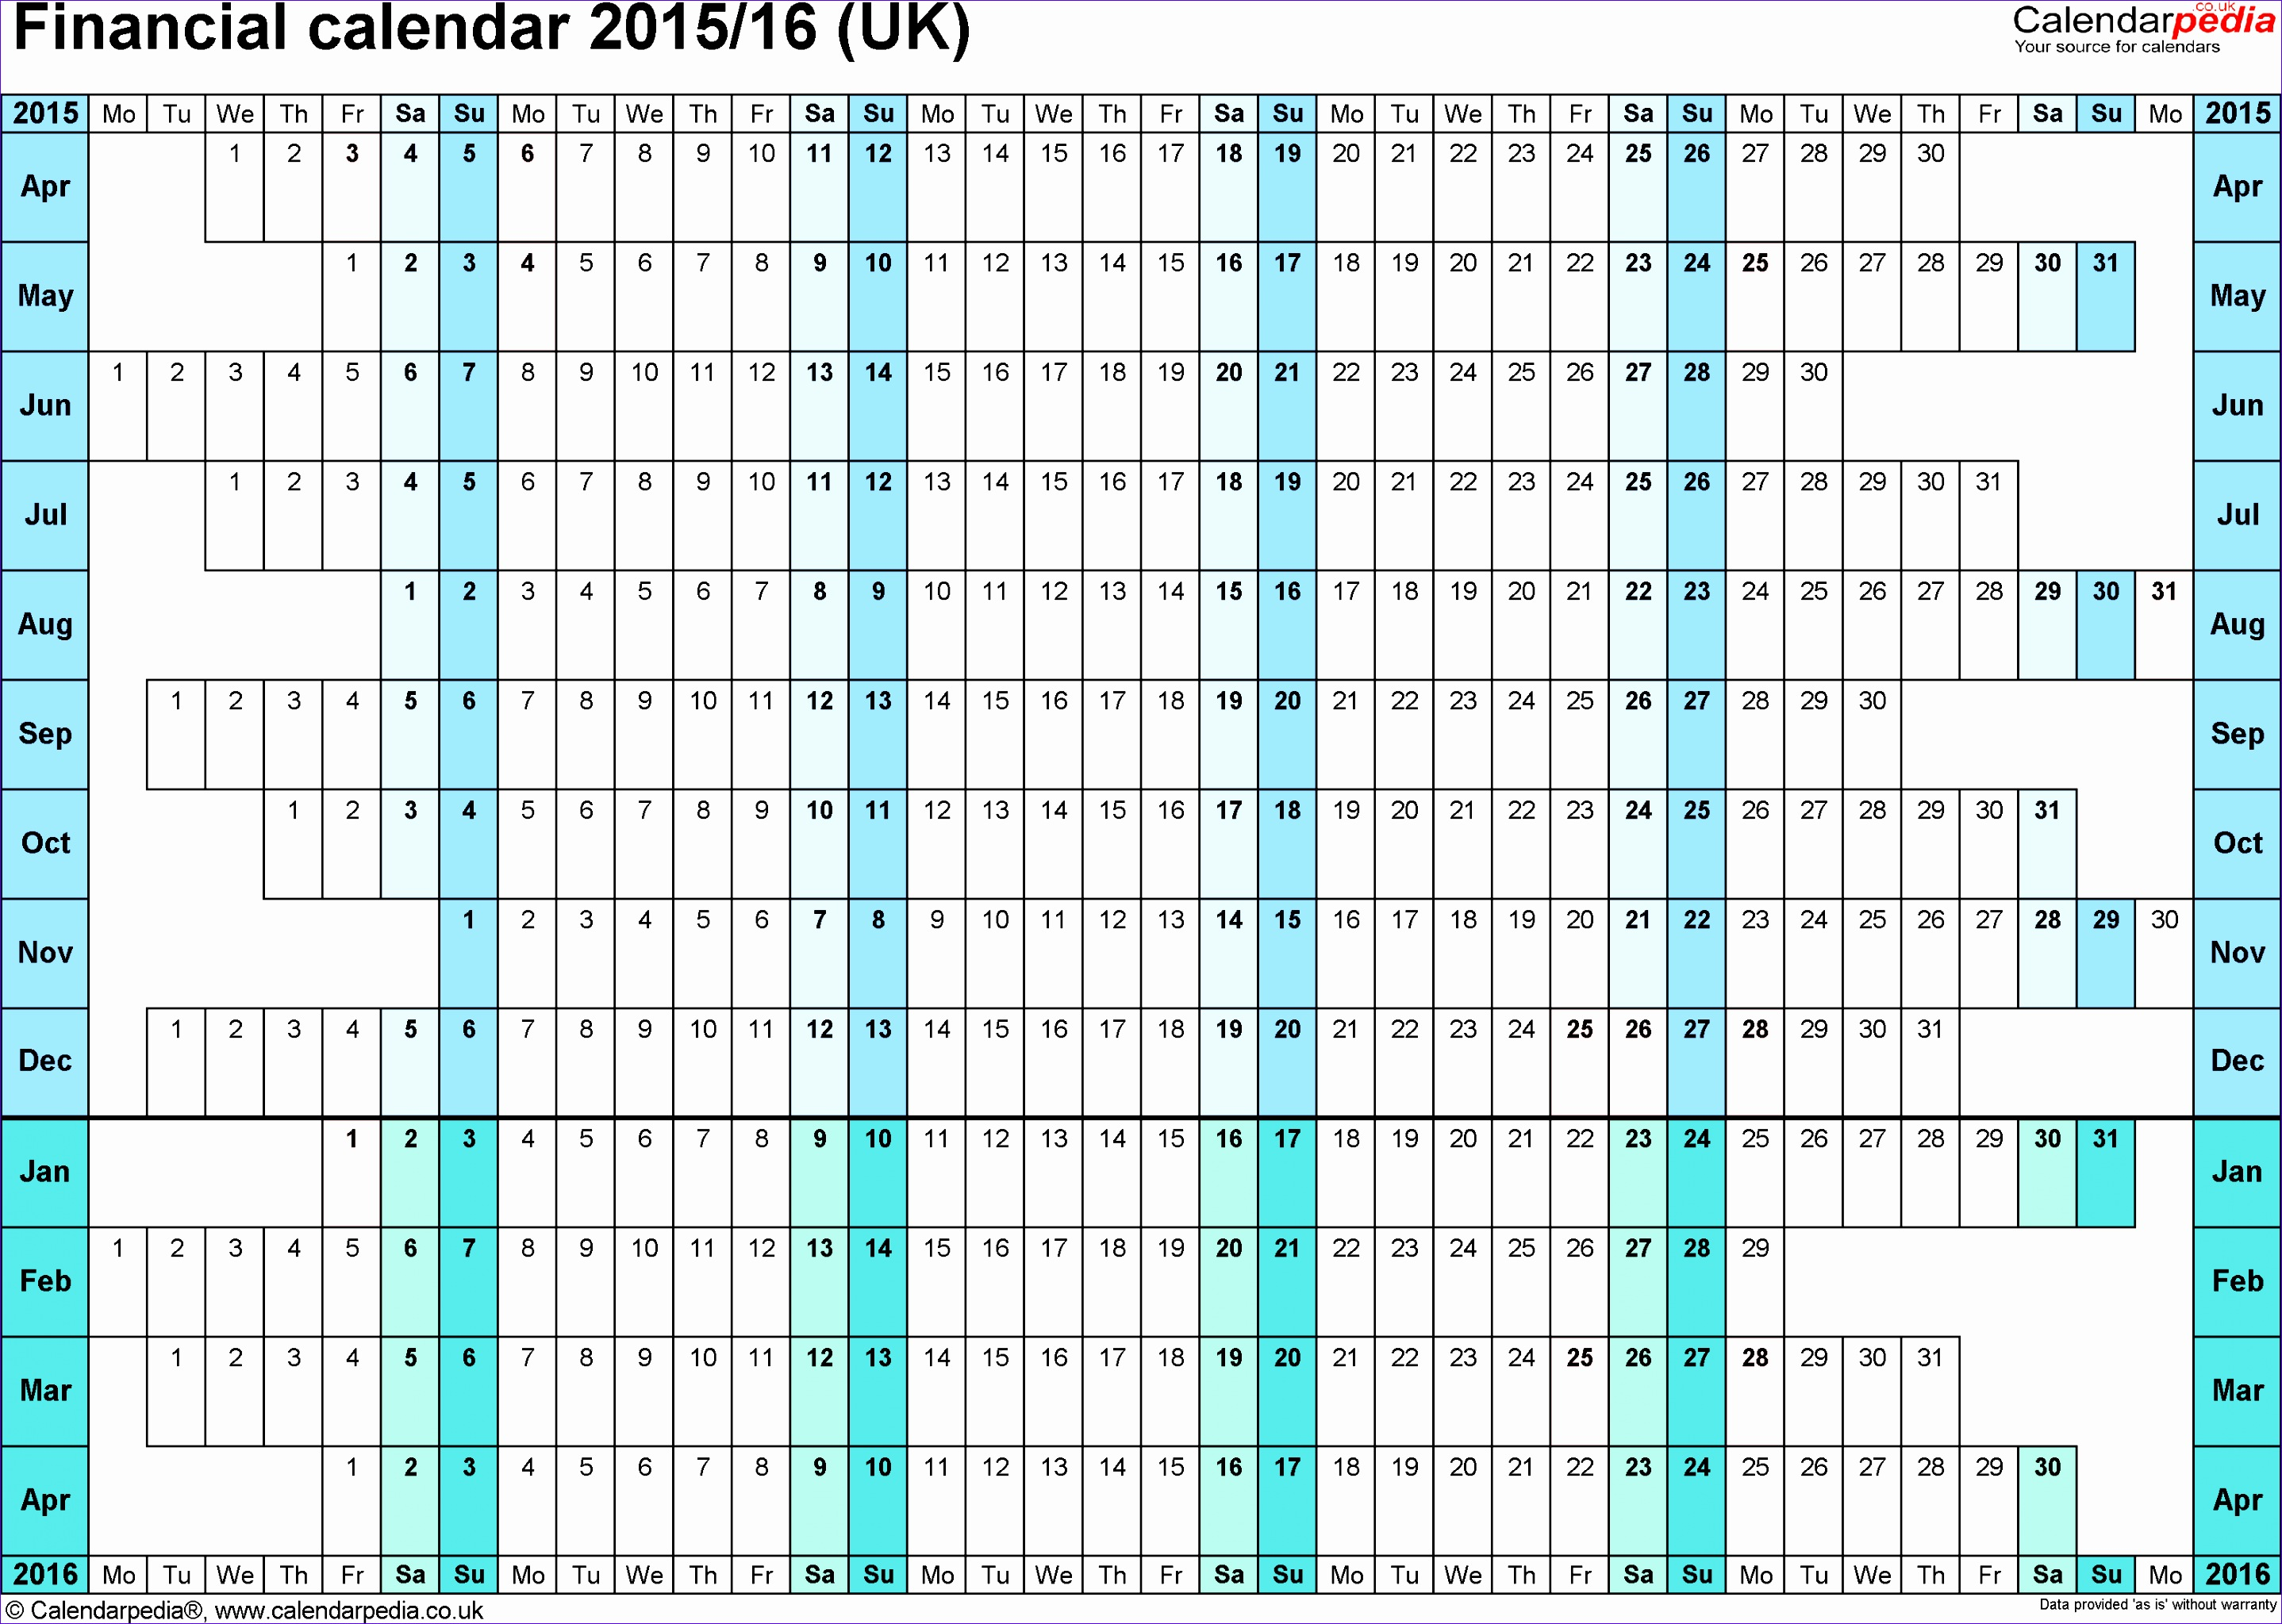 financial calendar 2015